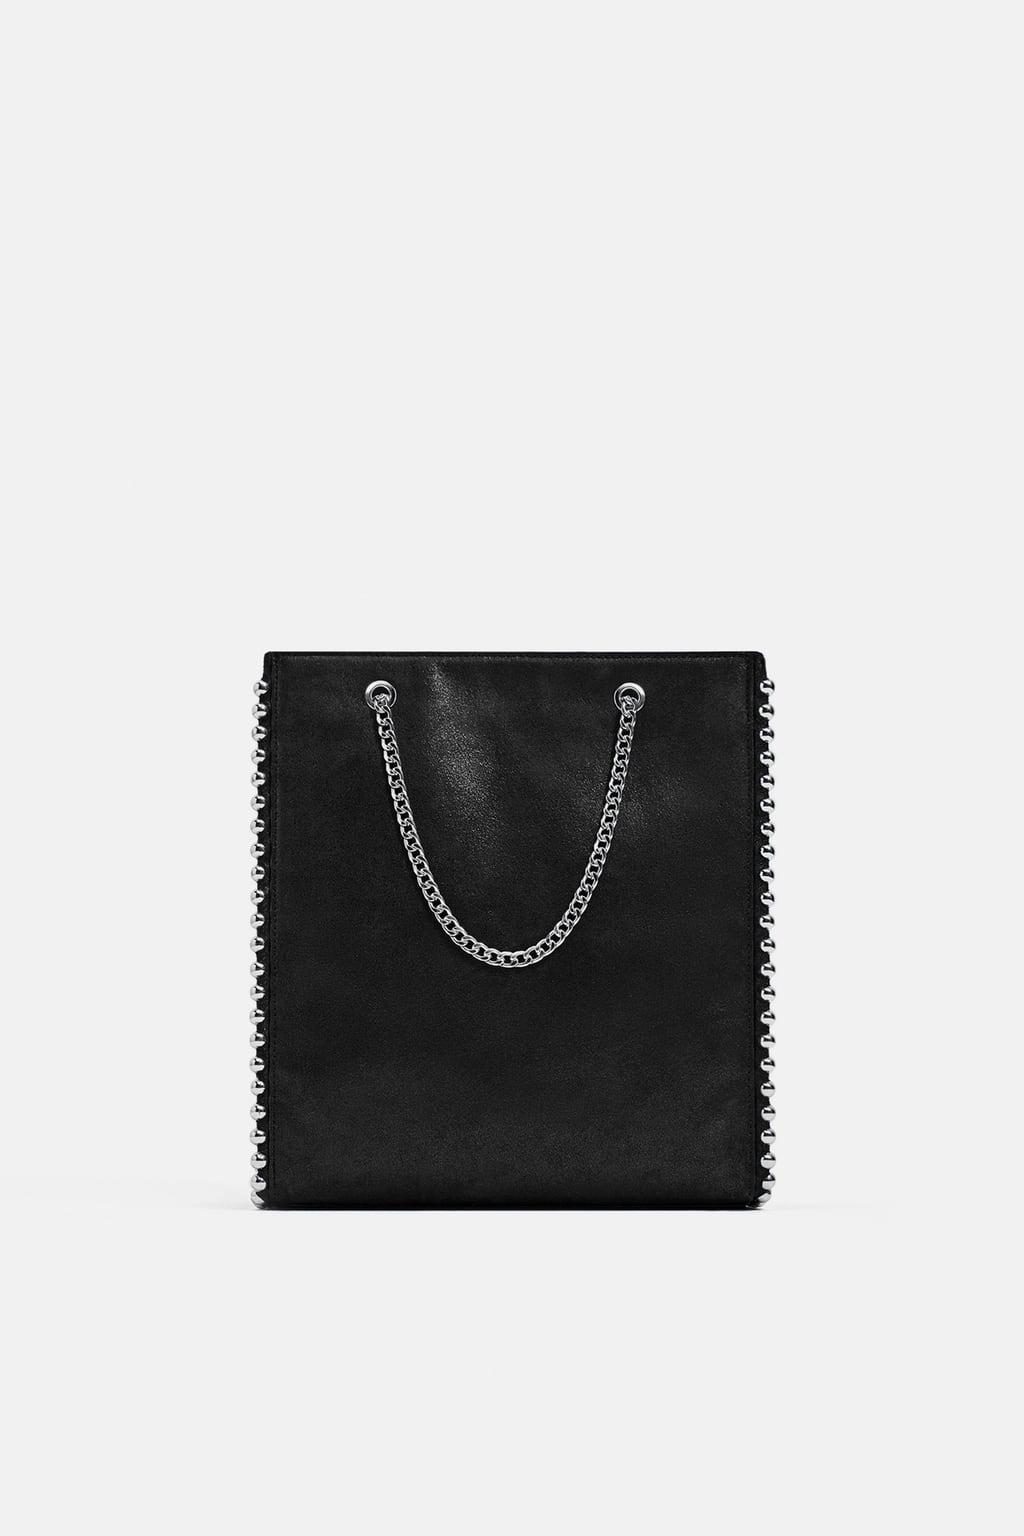 9c6478769e23d torebki Zara w Oficjalnym Archiwum Allegro - archiwum ofert